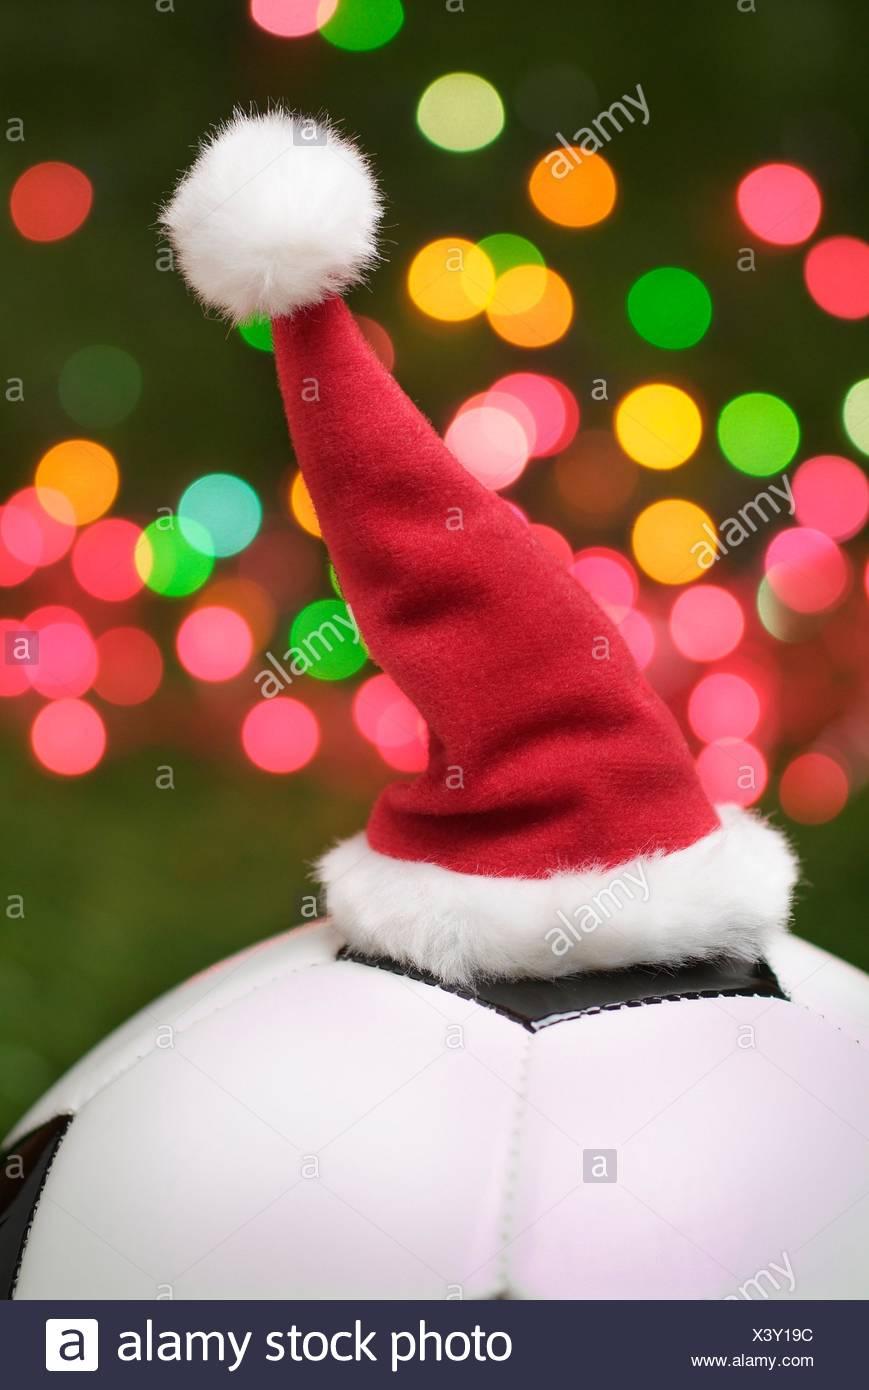 Football, Christmas Day, 2021 Santa Claus Hat On Football With Christmas Lights Stock Photo Alamy